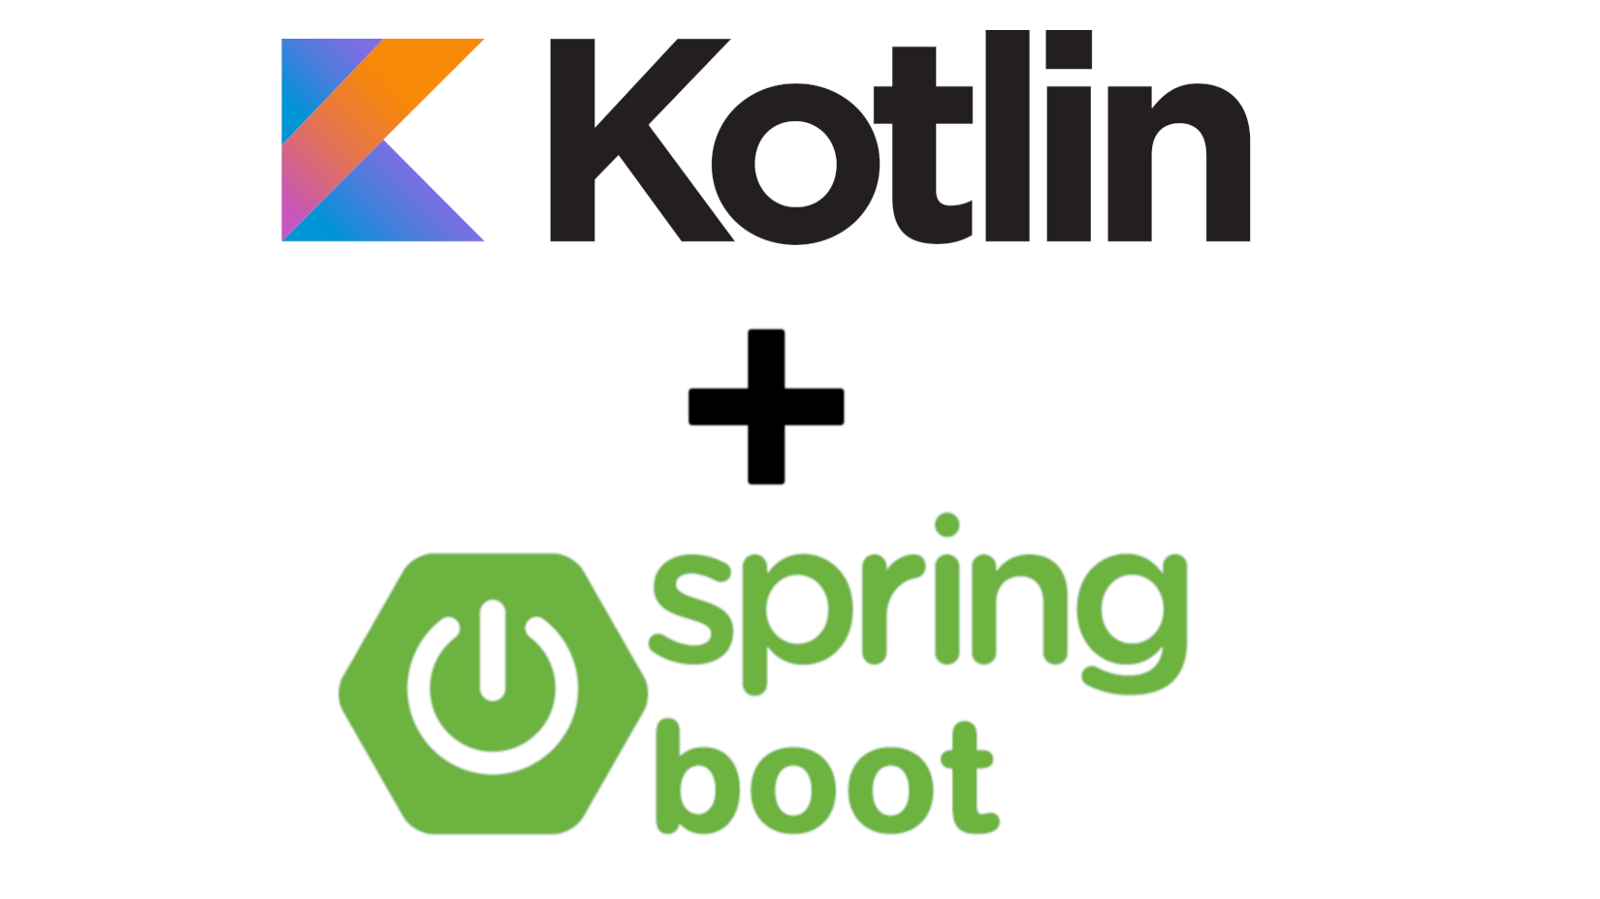 /kotlin-spring-boot-gotchas-e267be7ec022 feature image